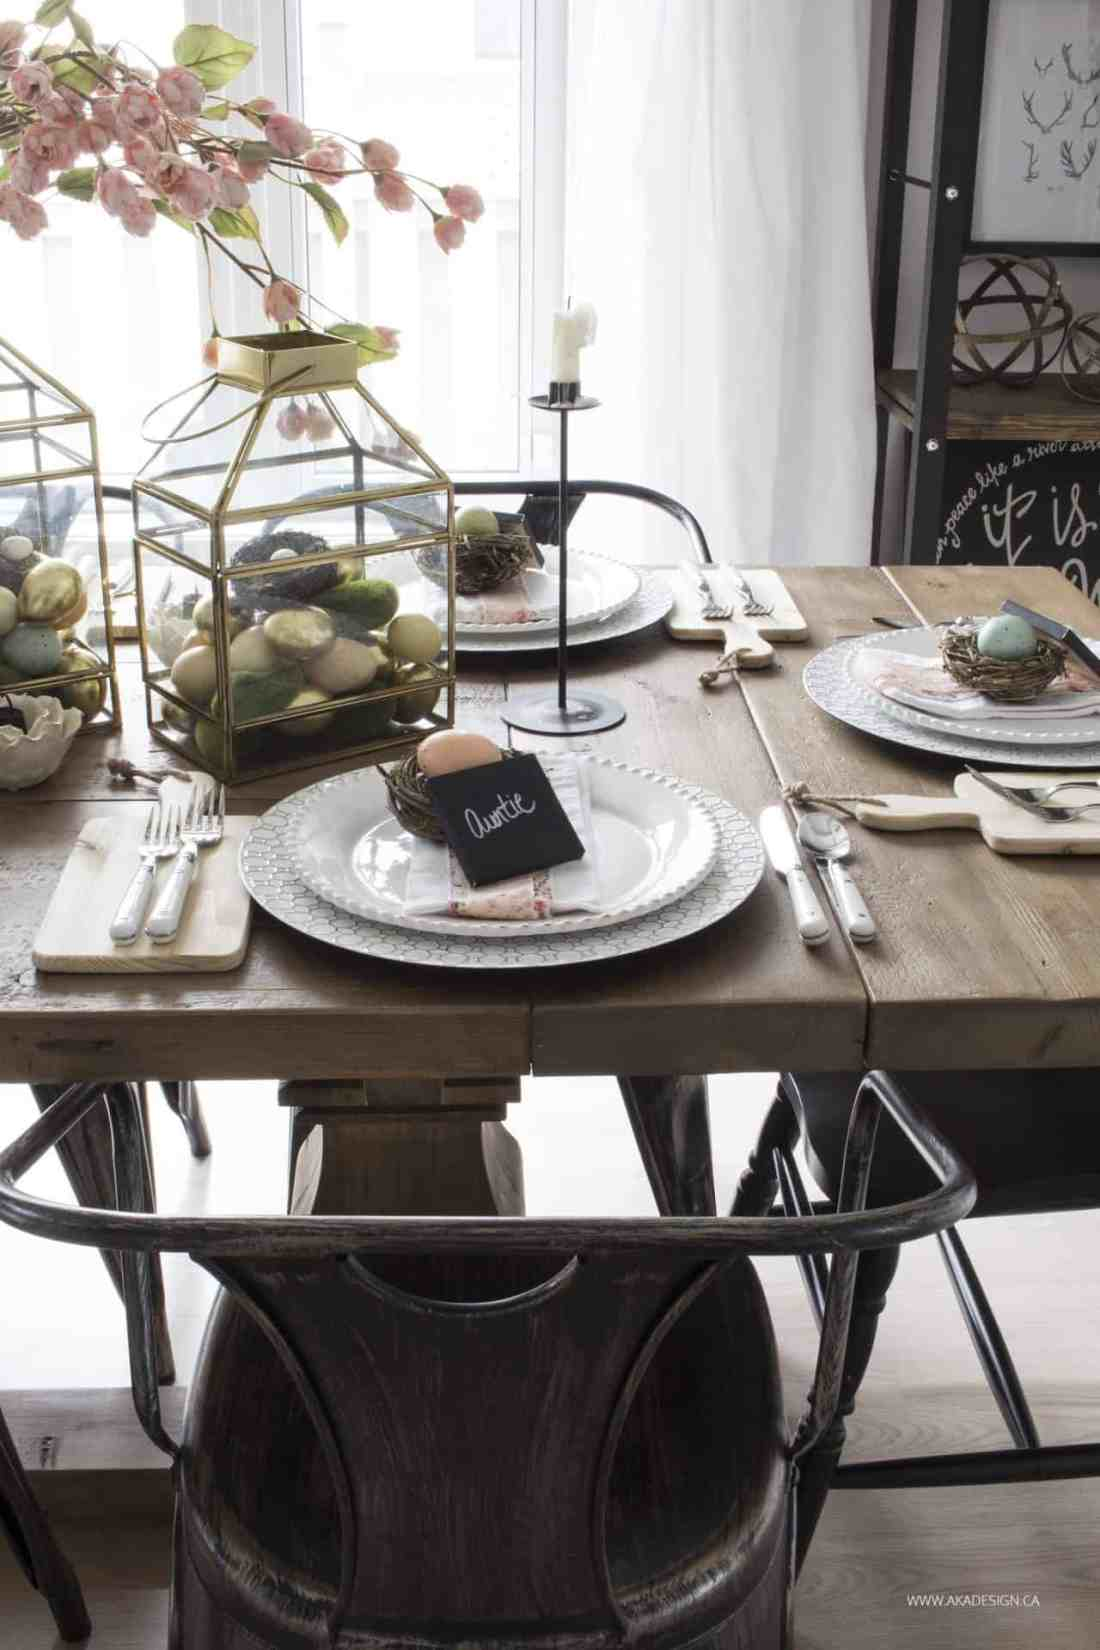 Home Made Lovely Spring 2017 Easter Table